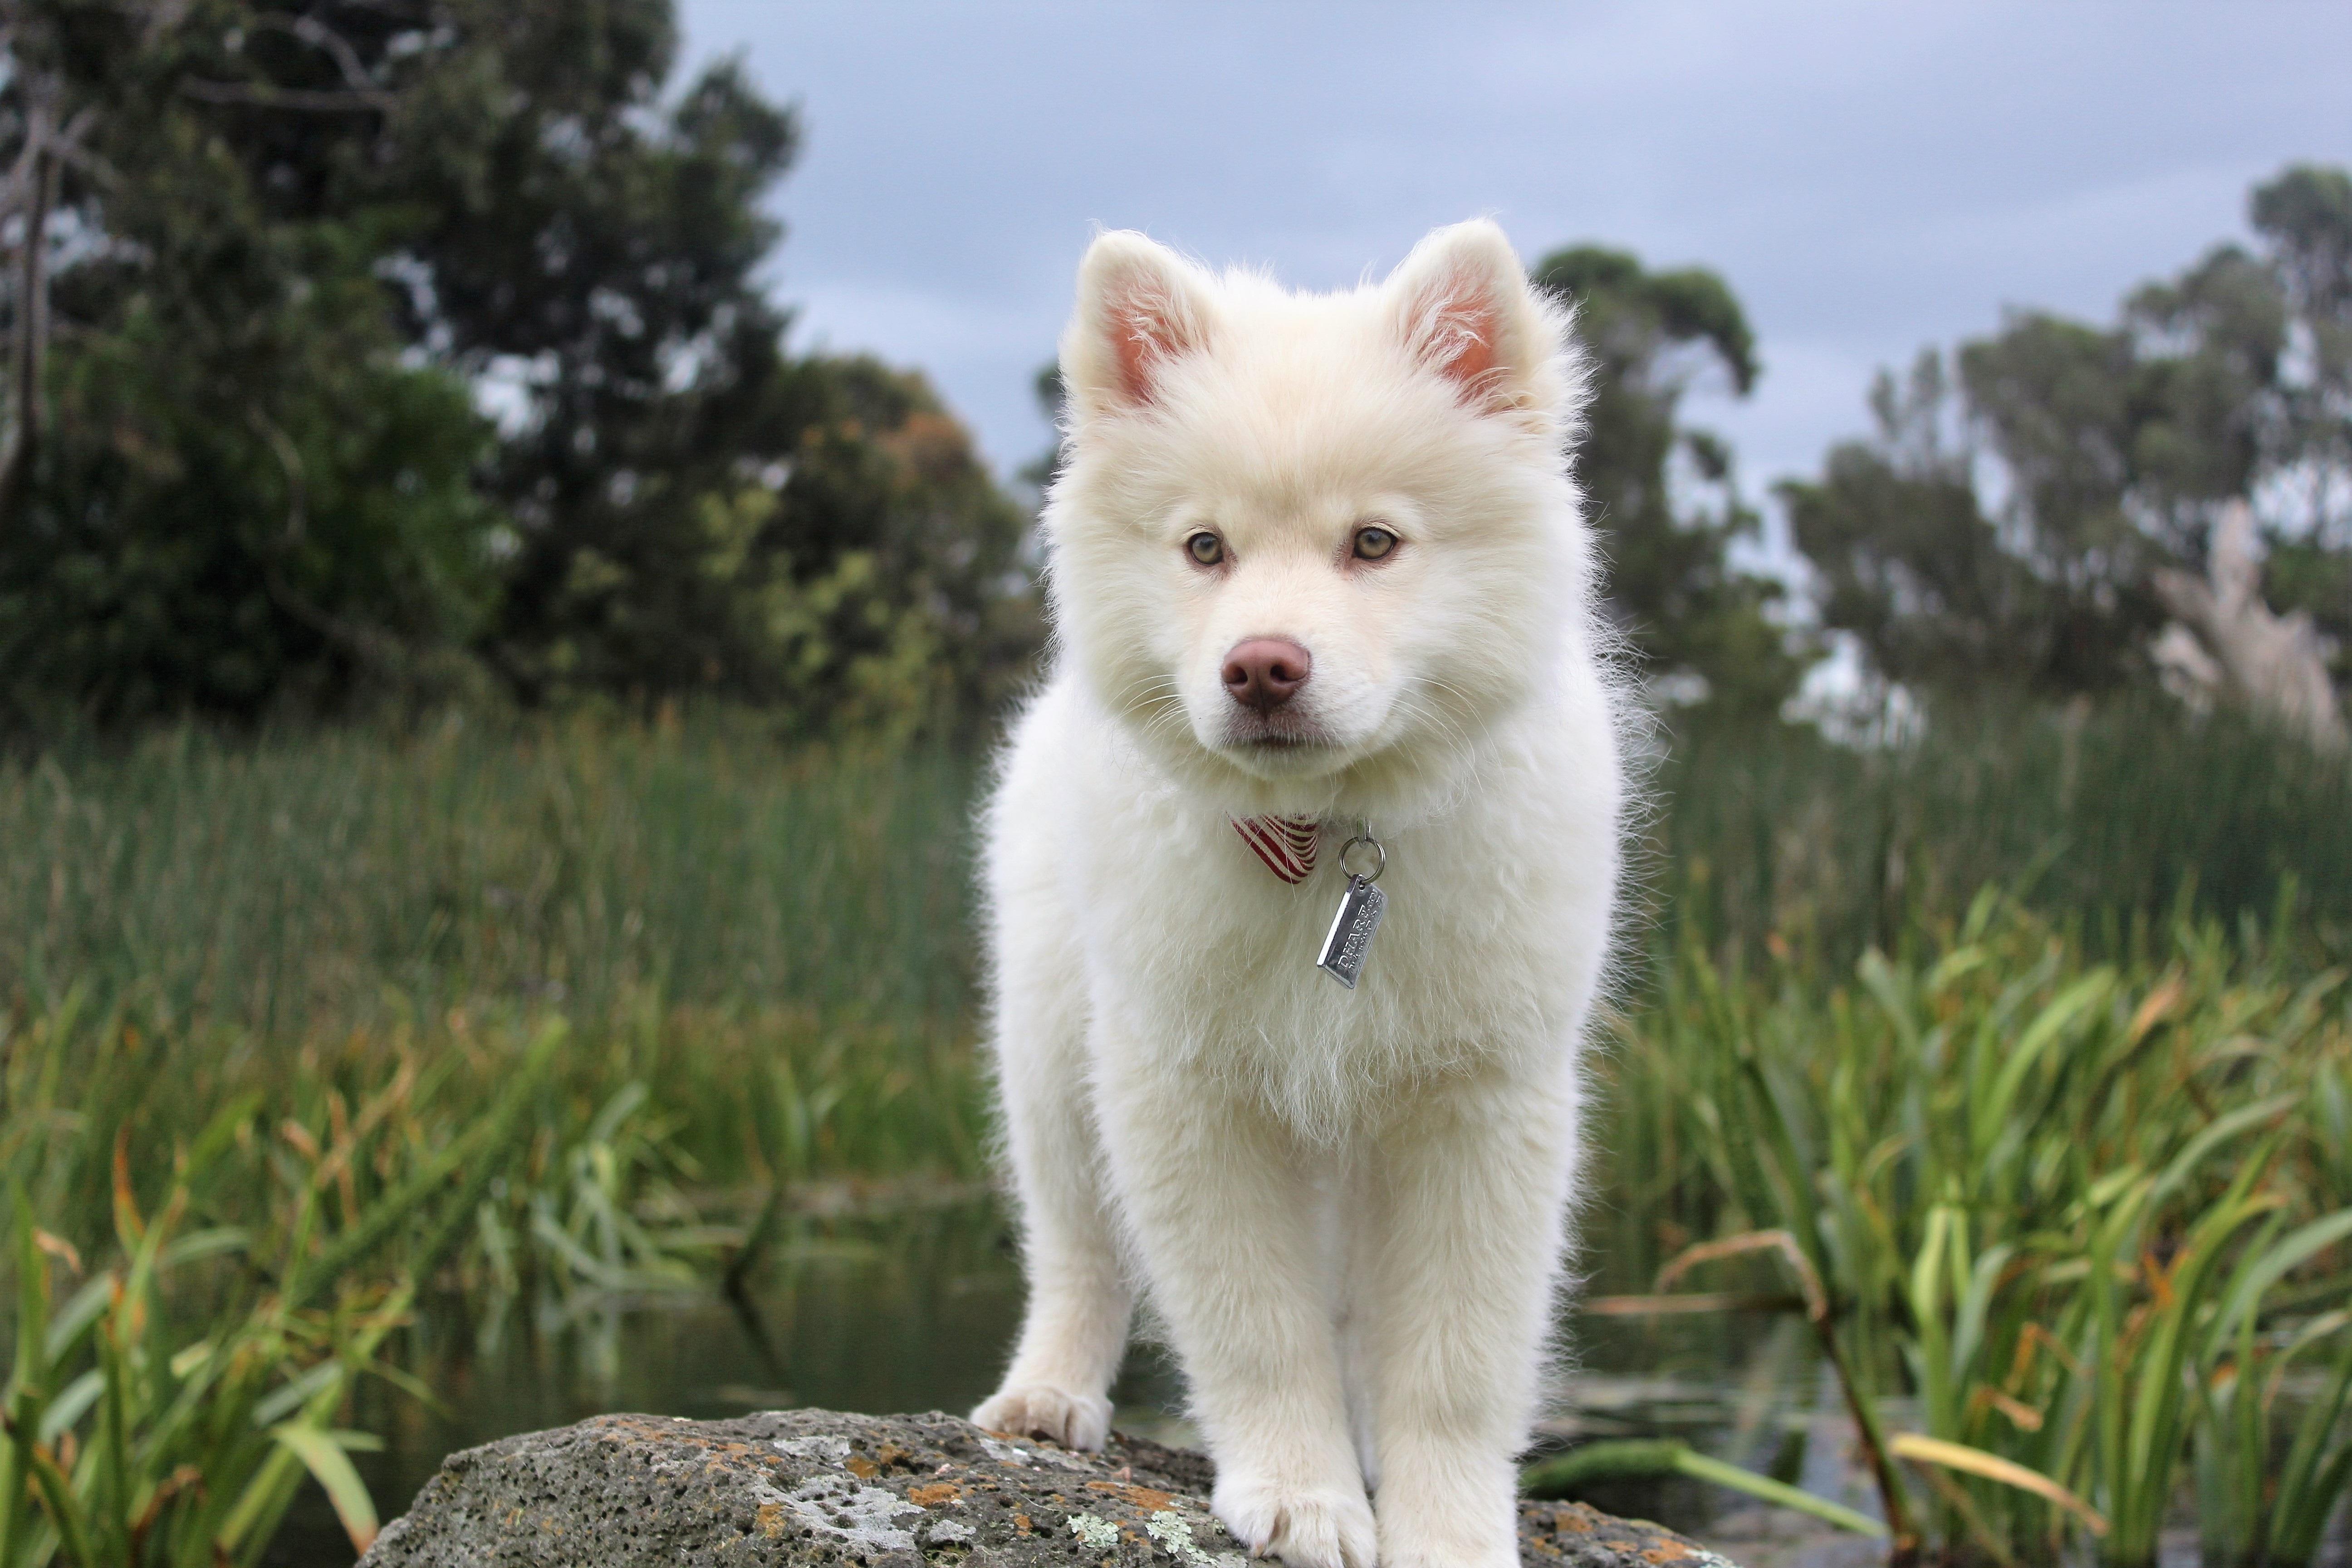 Simple Icelandic Sheepdog Canine Adorable Dog - nature-outdoor-white-meadow-play-sweet-puppy-dog-animal-cute-canine-looking-love-pet-portrait-young-small-mammal-baby-friend-playful-lovely-little-vertebrate-domestic-dog-breed-pomeranian-doggy-purebred-pedigree-siberian-husky-dog-like-mammal-carnivoran-dog-breed-group-greenland-dog-east-siberian-laika-west-siberian-laika-alaskan-klee-kai-icelandic-sheepdog-german-spitz-mittel-japanese-spitz-american-eskimo-dog-german-spitz-german-spitz-klein-volpino-italiano-kishu-norwegian-buhund-1173217  Trends_167114  .jpg